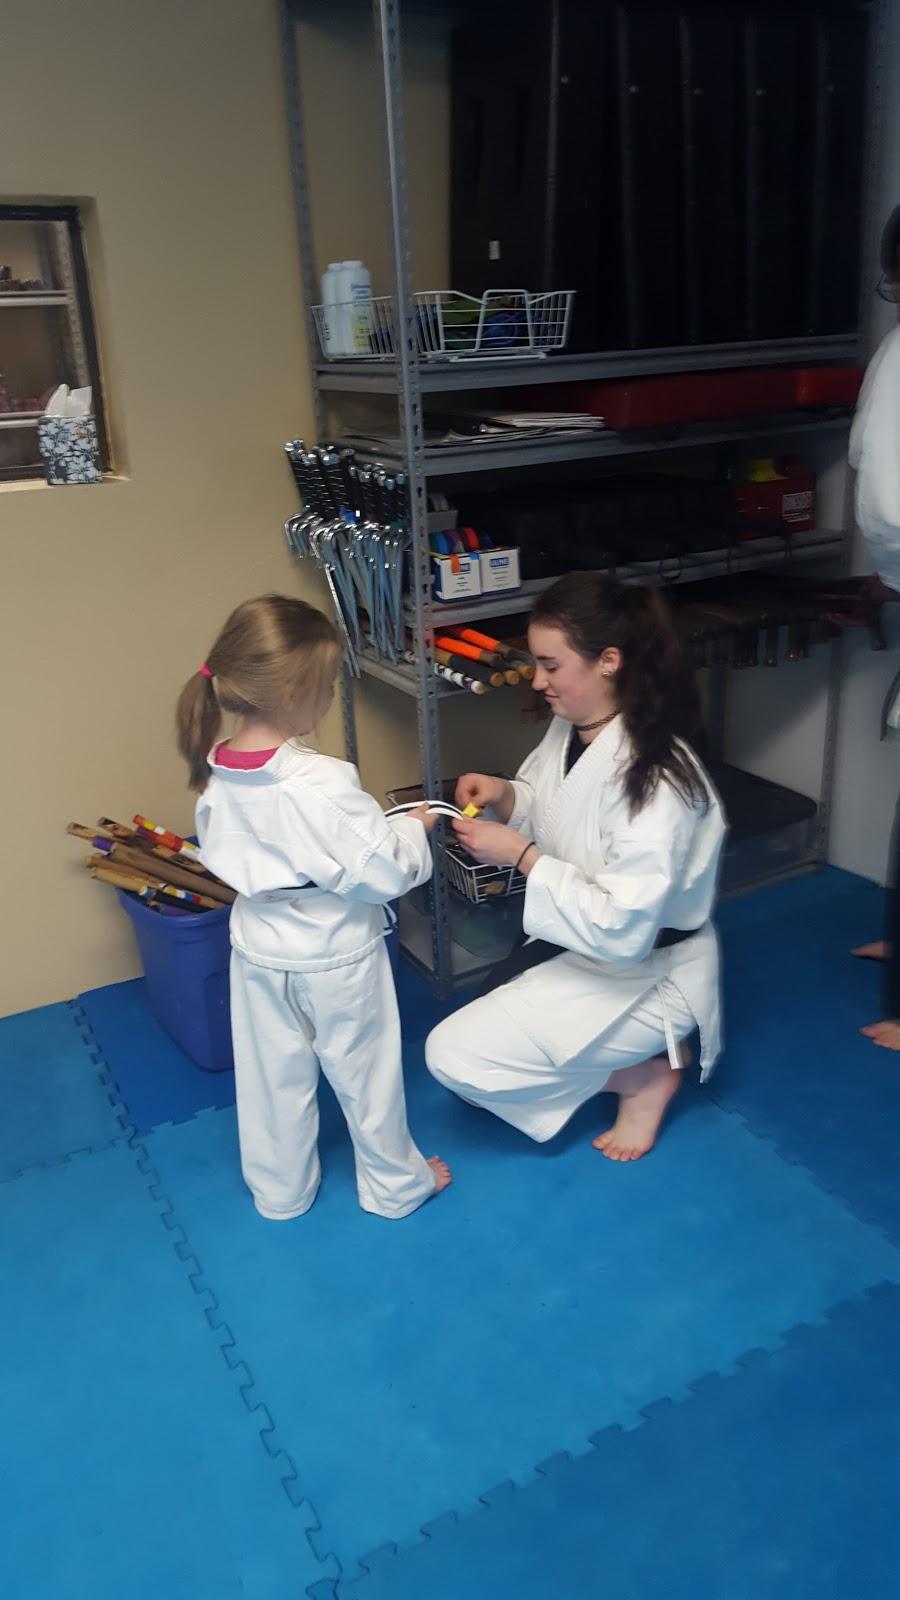 Pikes Peak Karate - gym  | Photo 4 of 10 | Address: 5245 Galley Rd, Colorado Springs, CO 80915, USA | Phone: (719) 648-2514